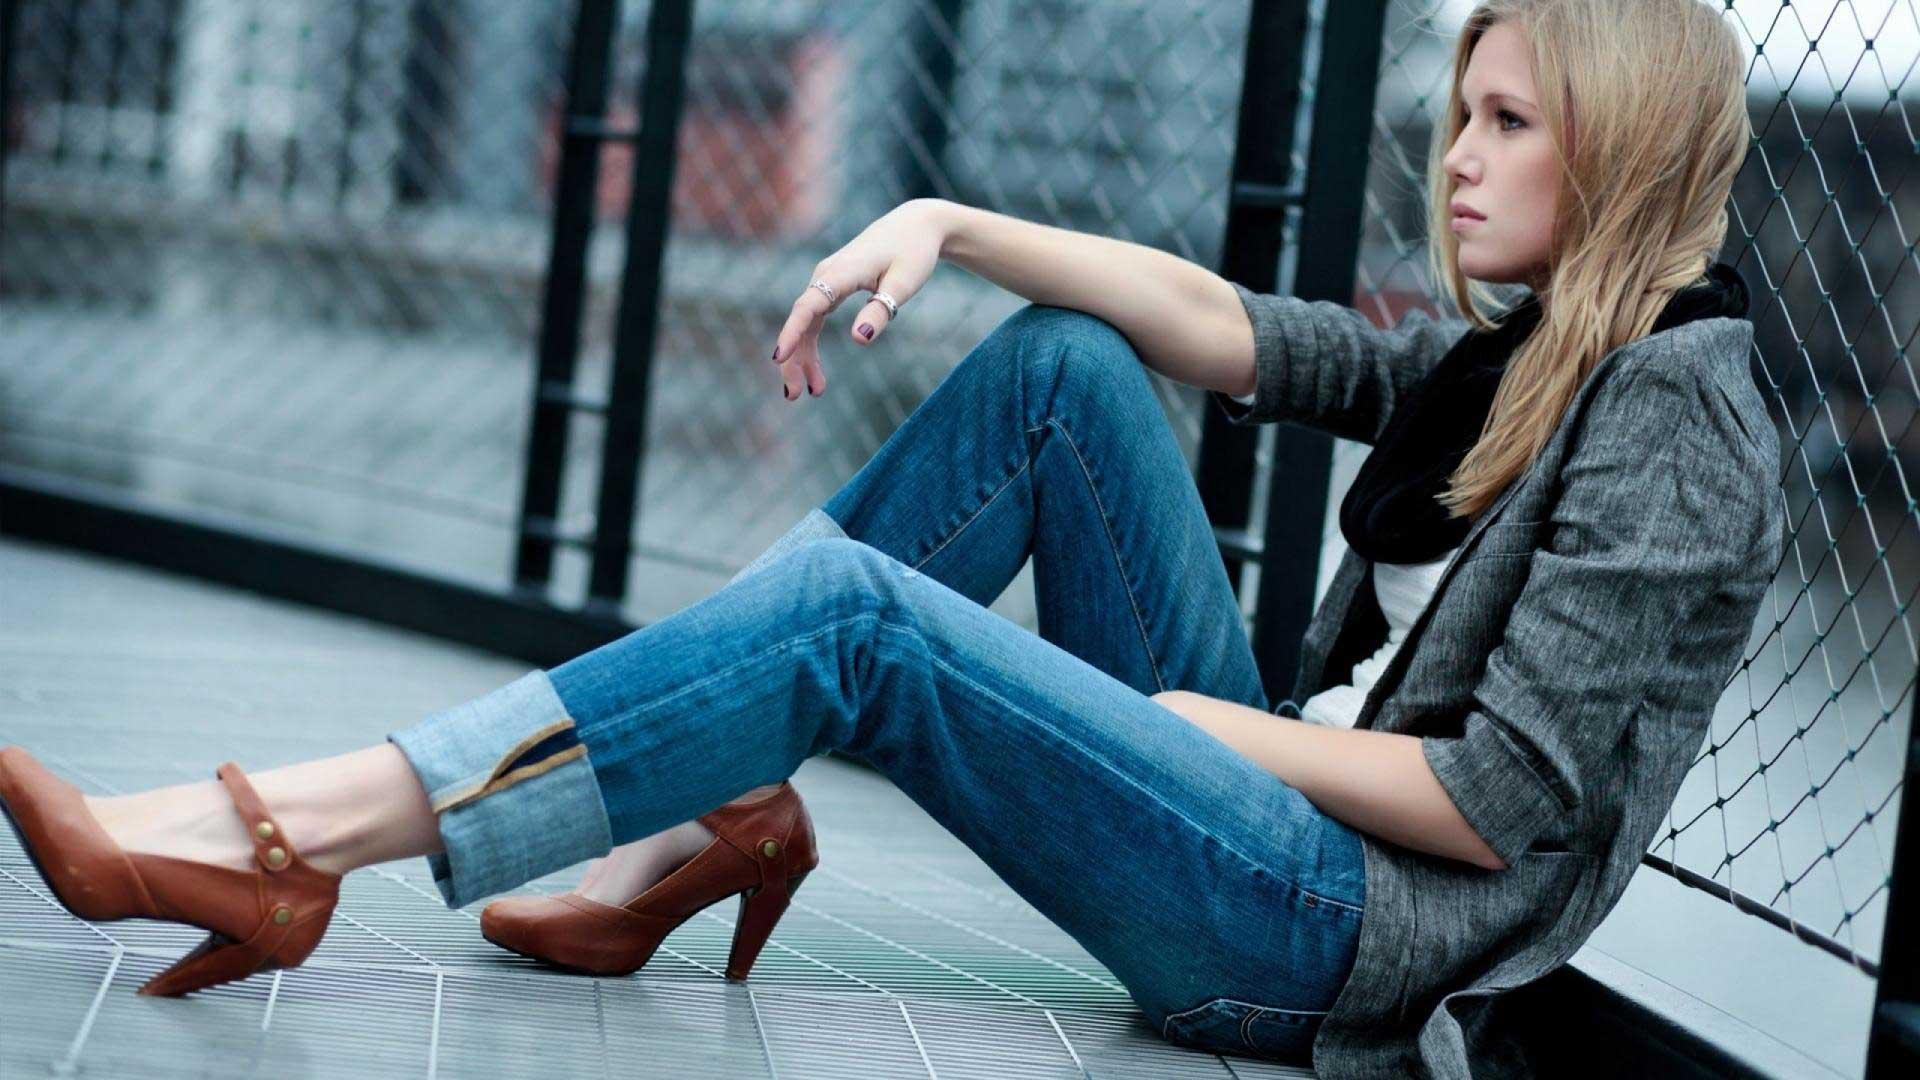 Modelos de ropas en jeans archives mujer chic Fashion style girl jeans 2015